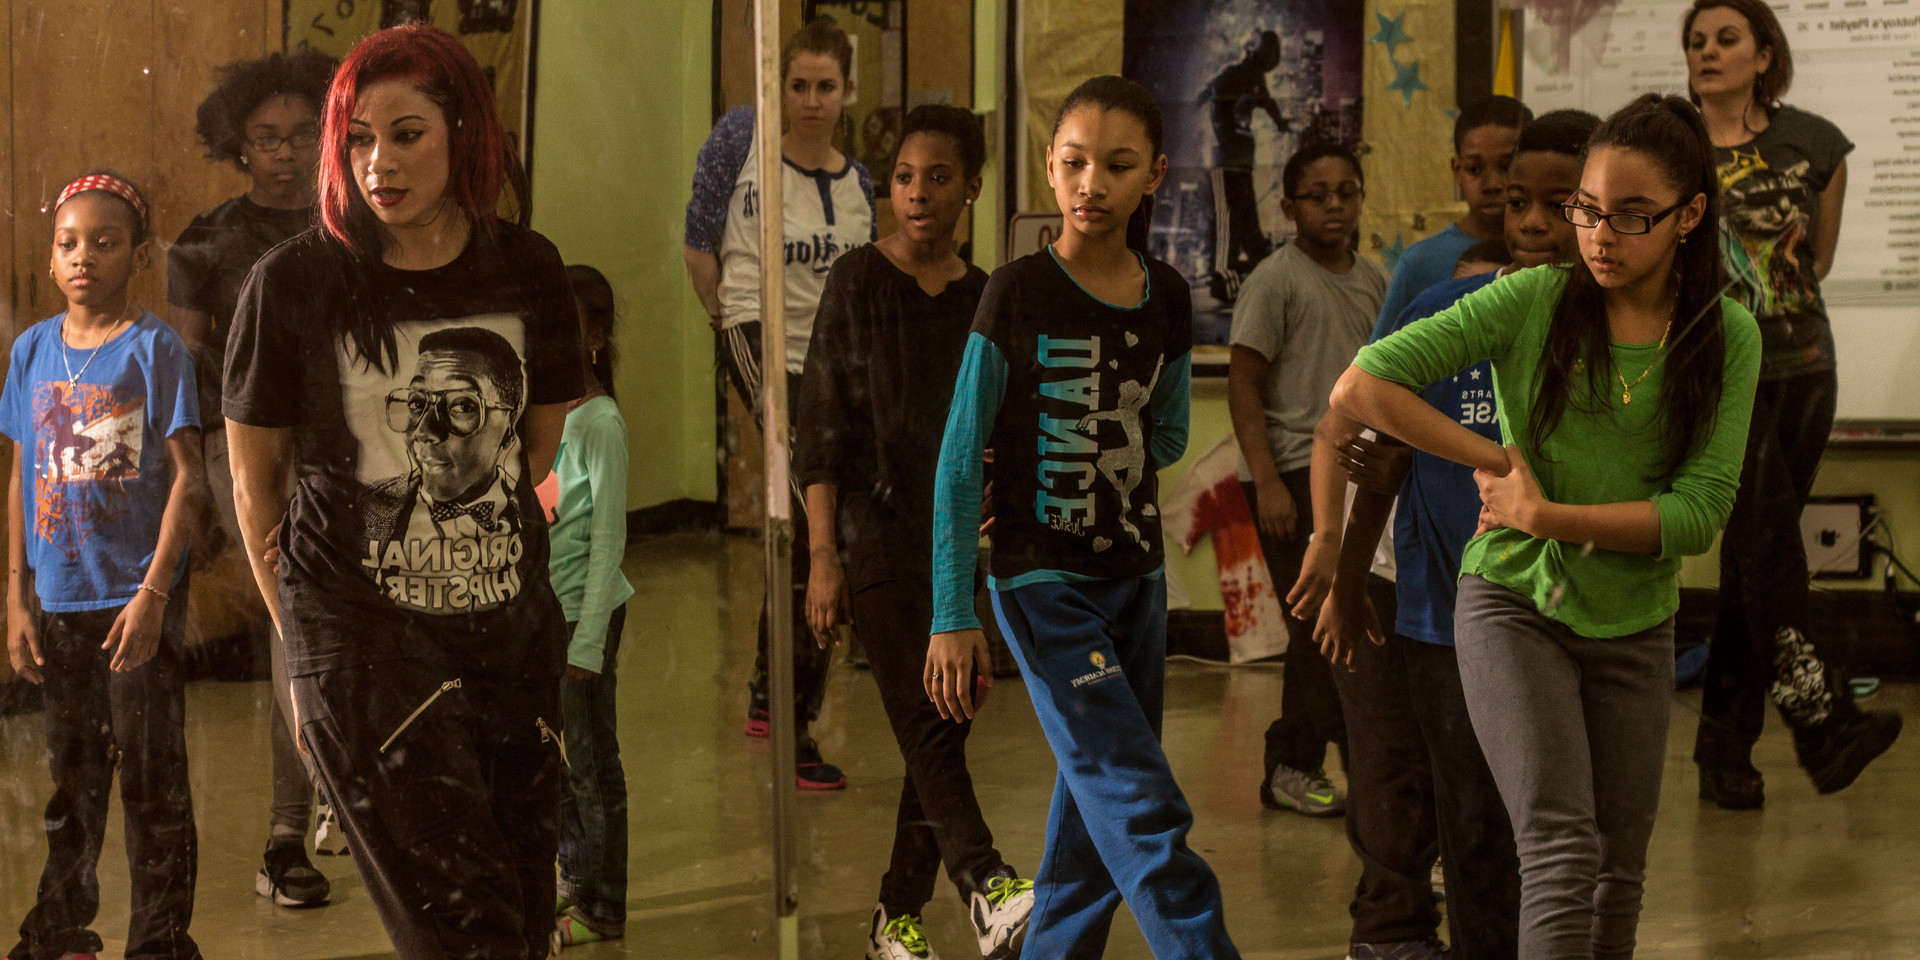 Bronx Charter School NIM workshop